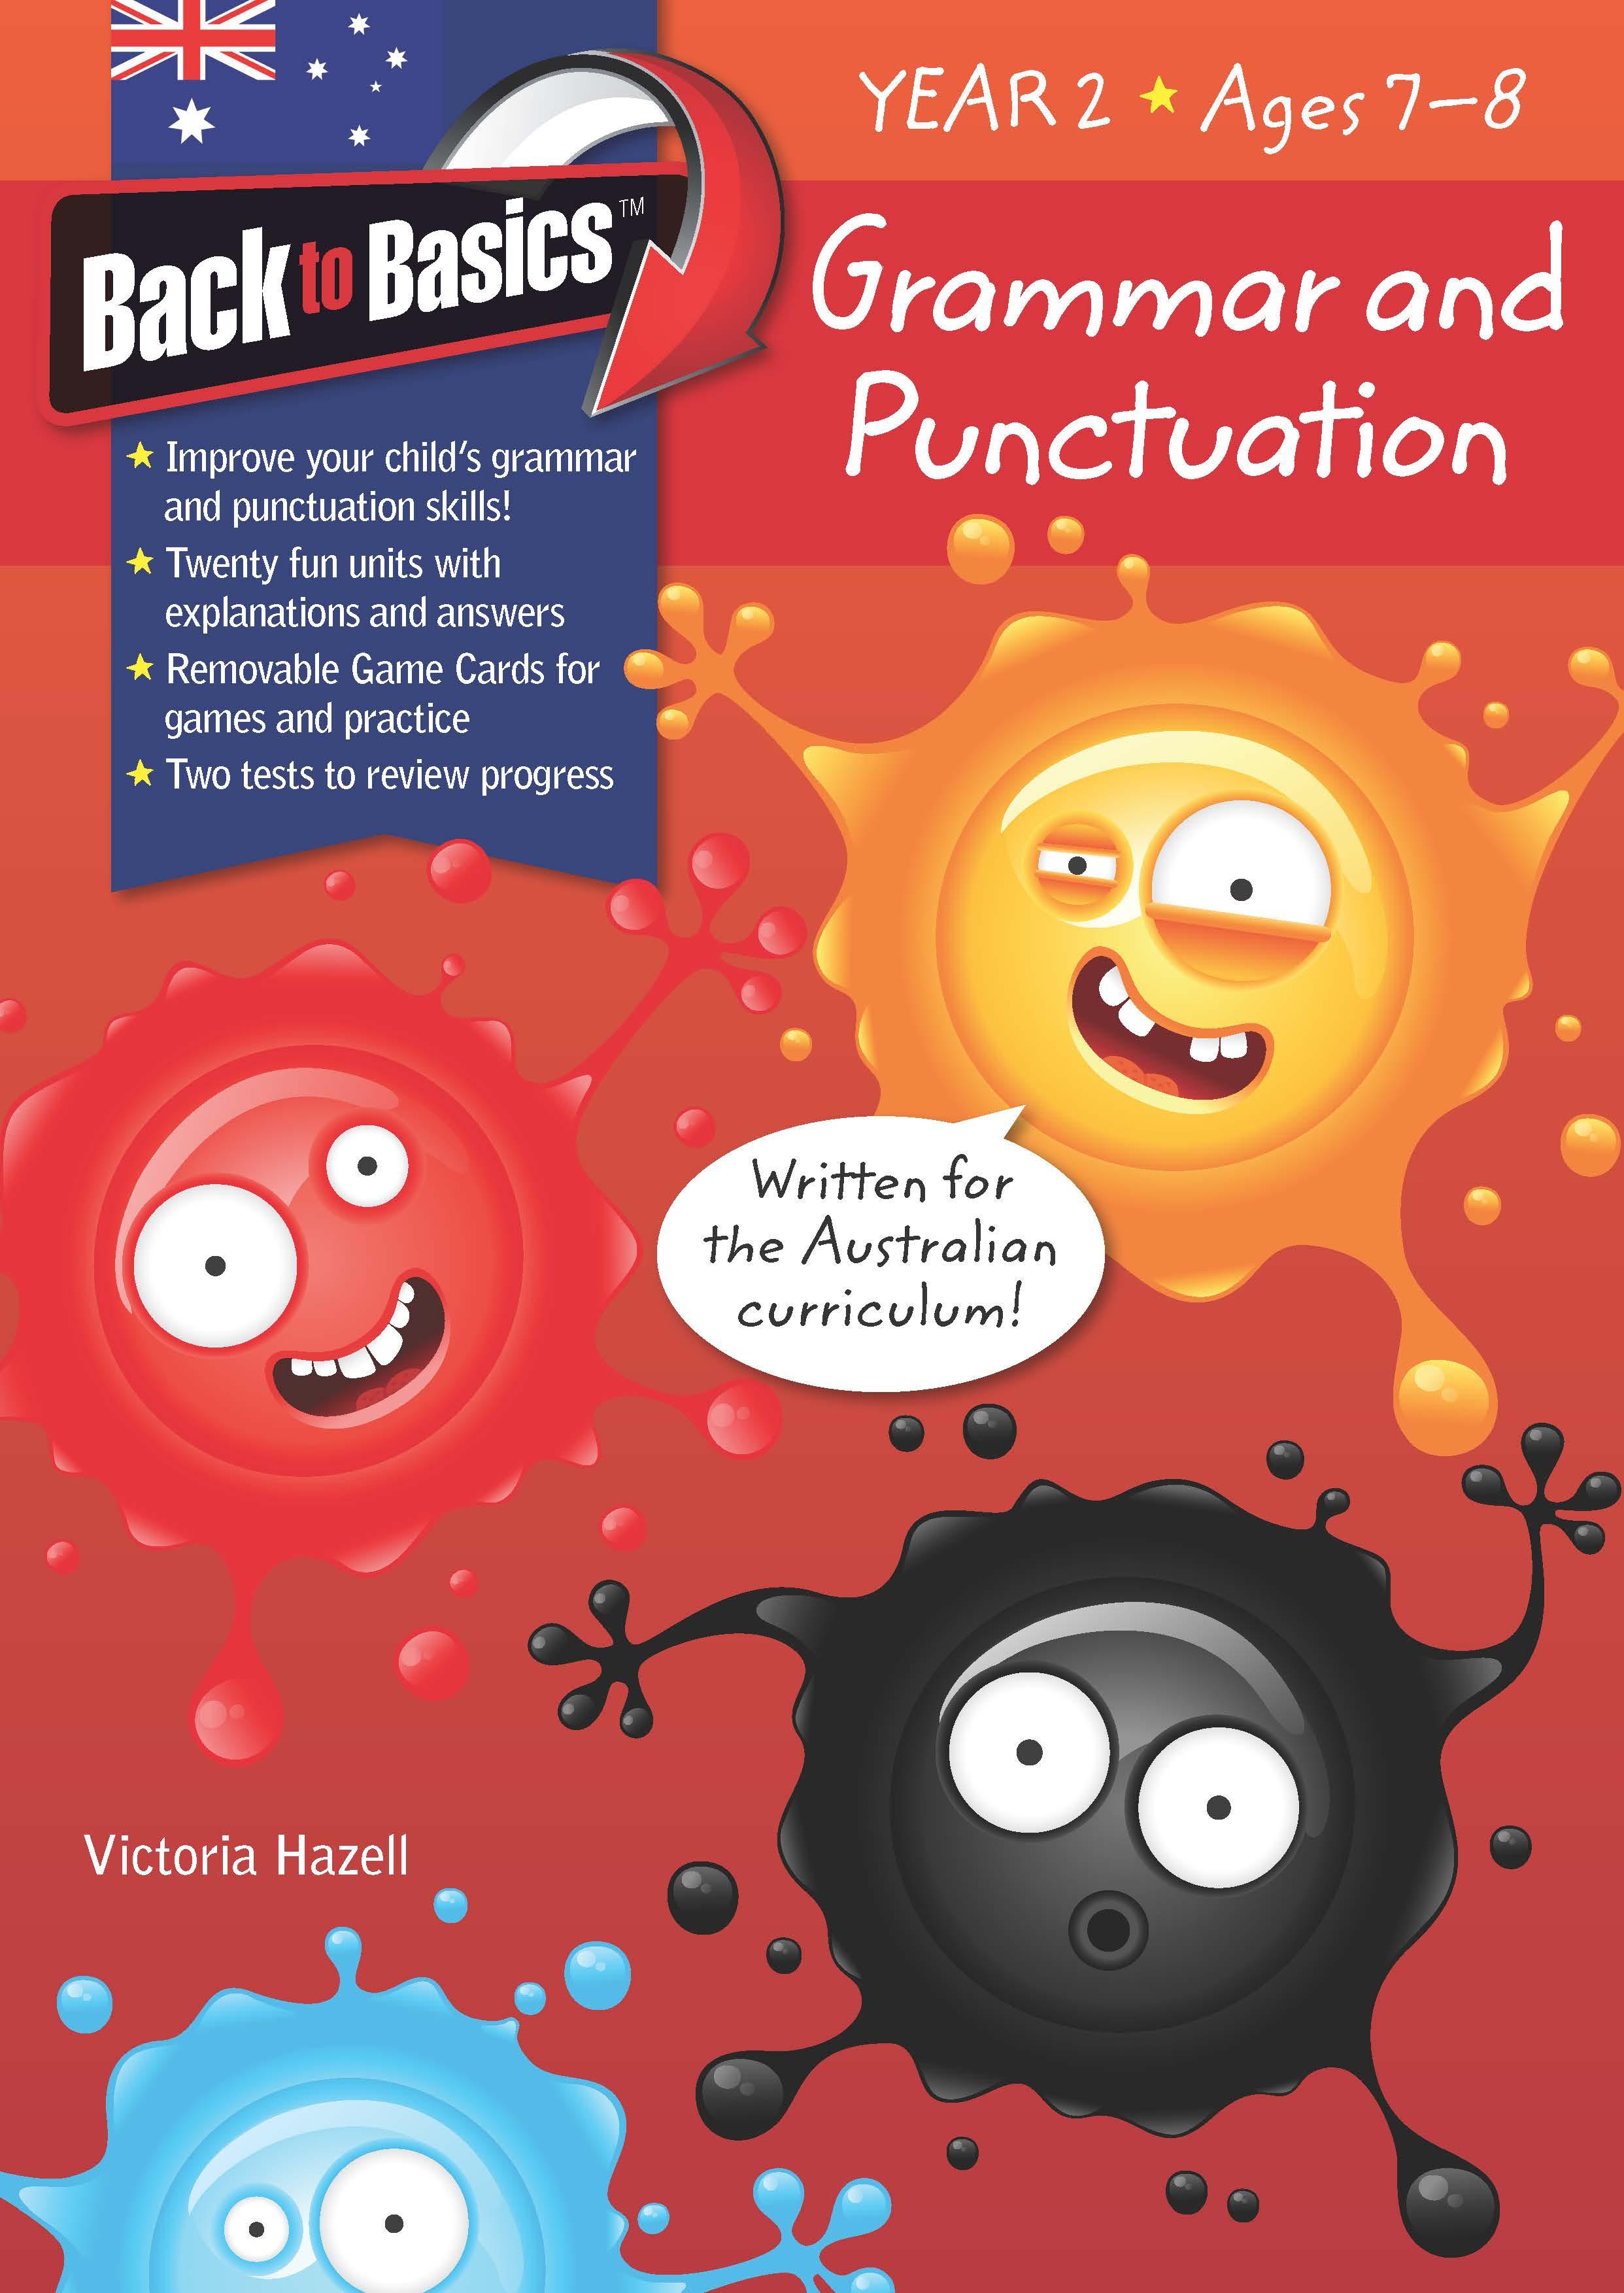 Back to Basics - Grammar & Punctuation Year 2